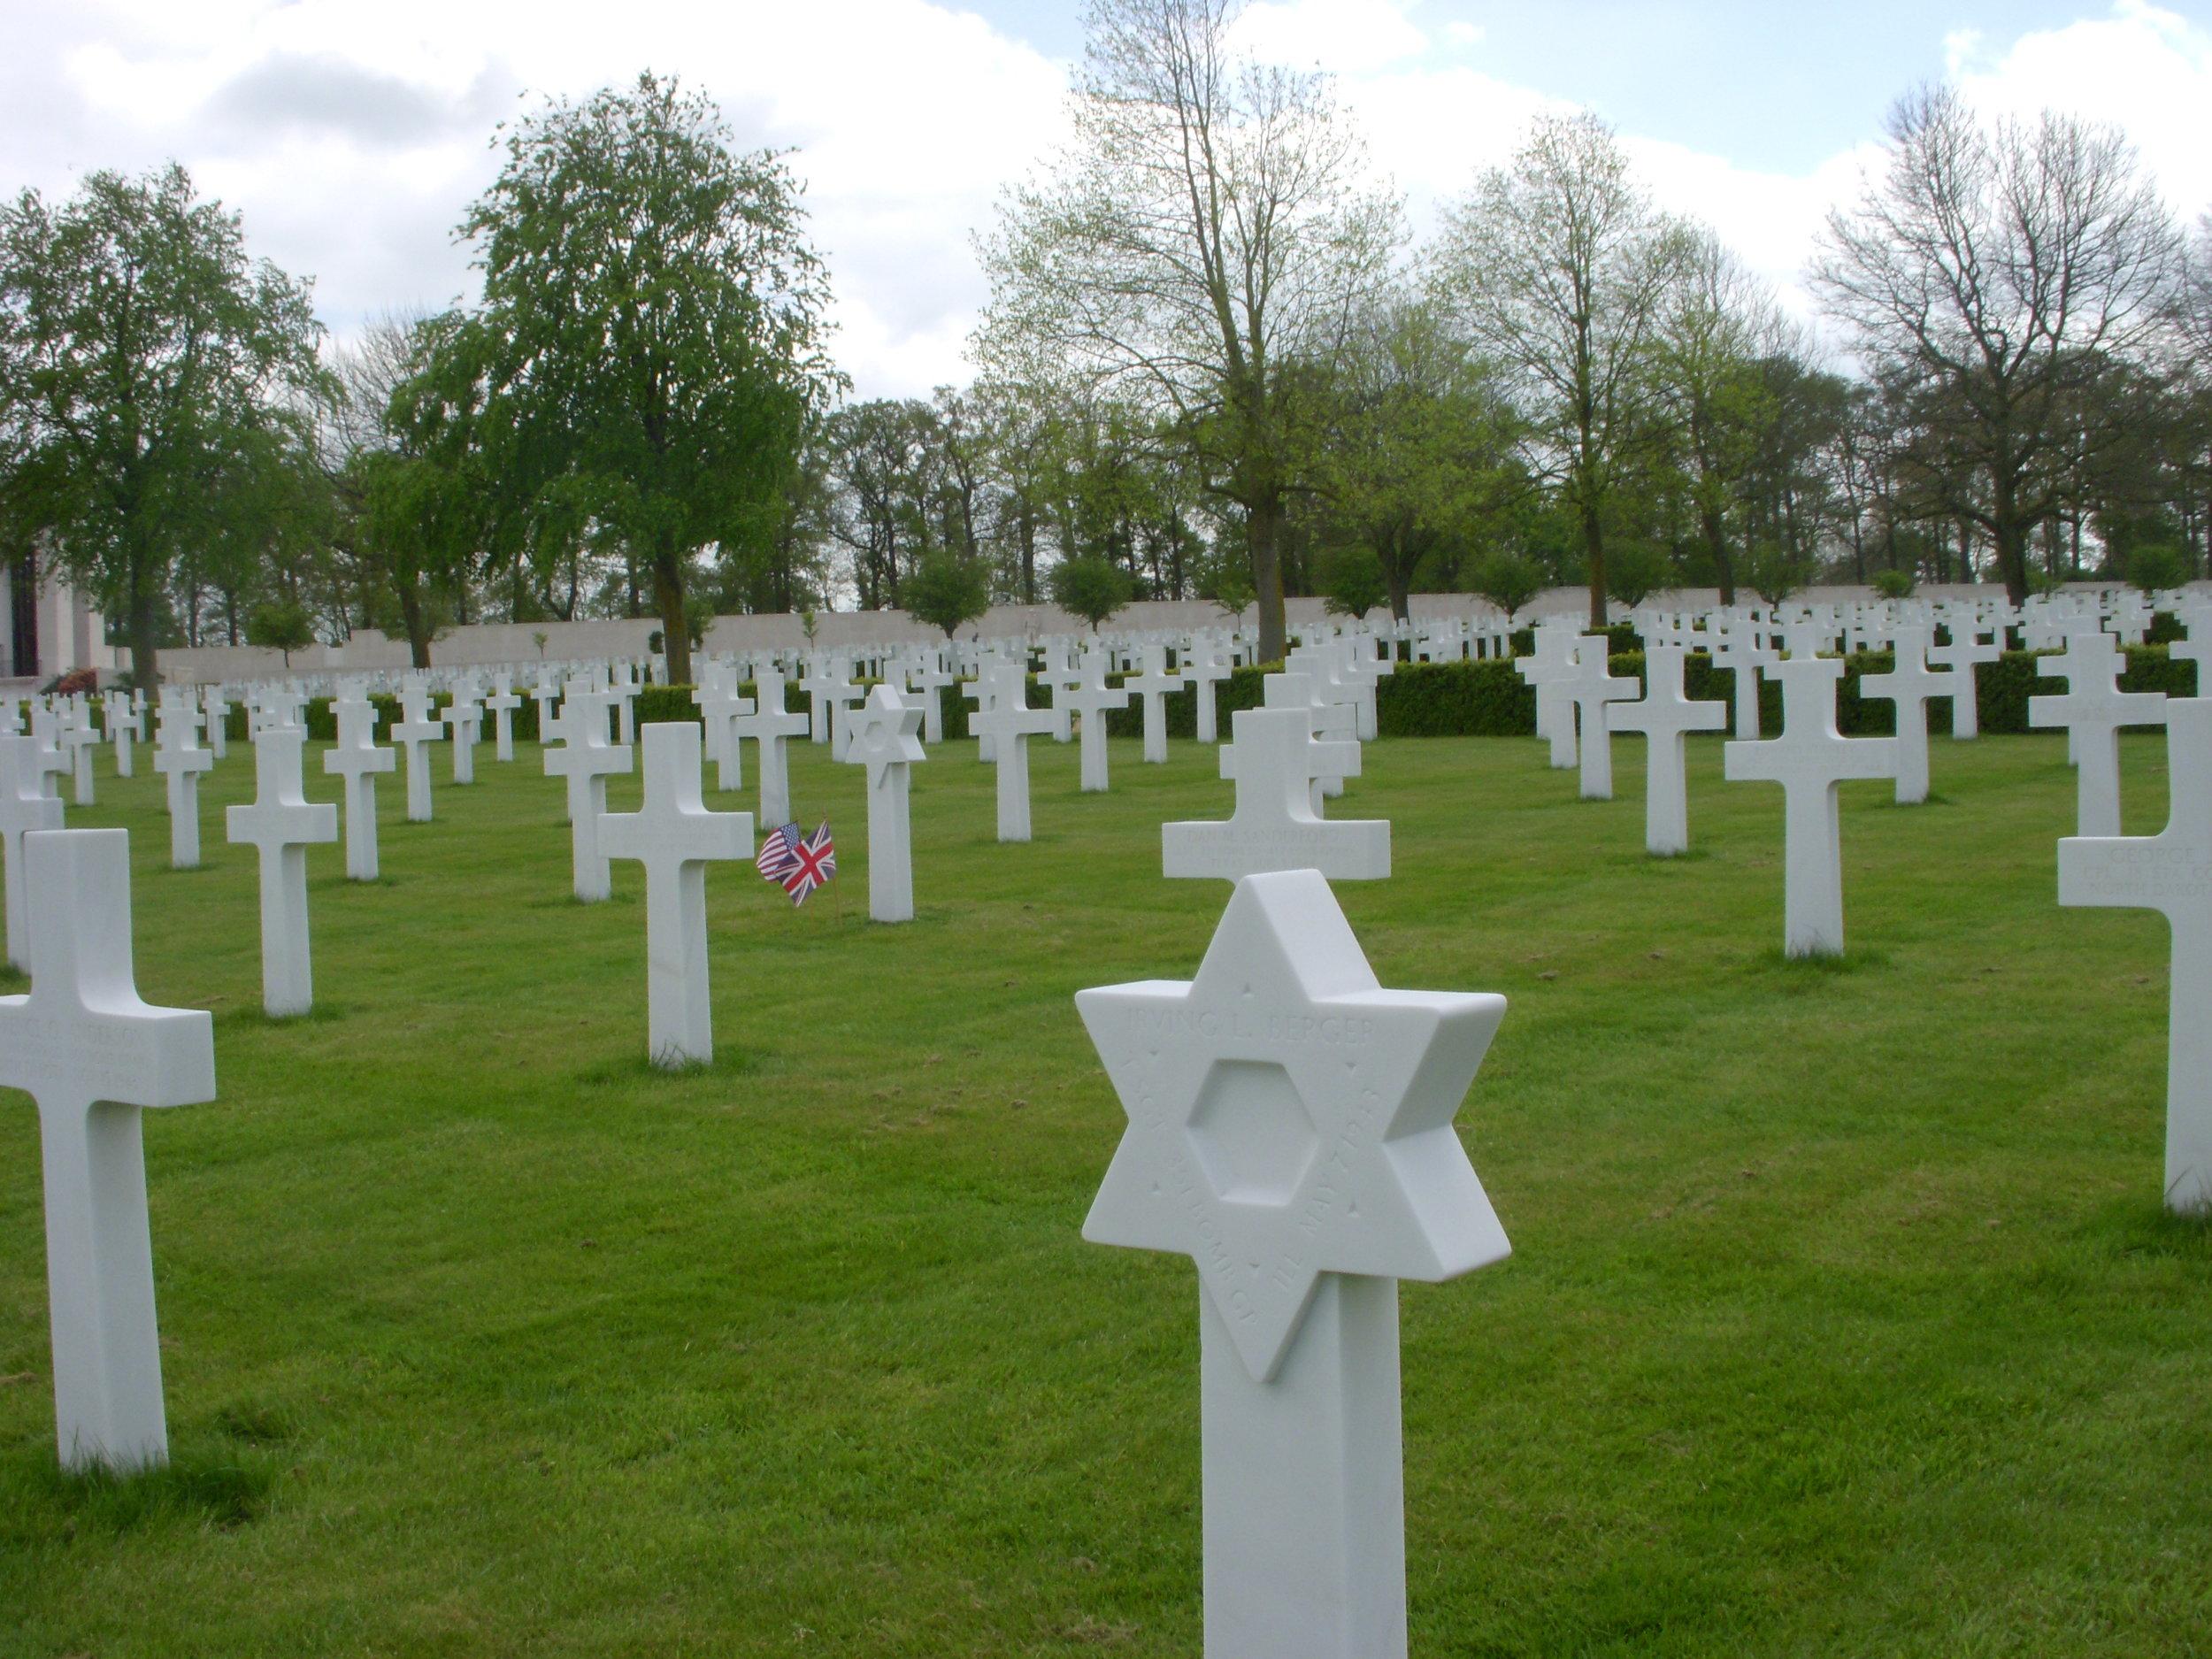 American WWII cemetery in Cambridge